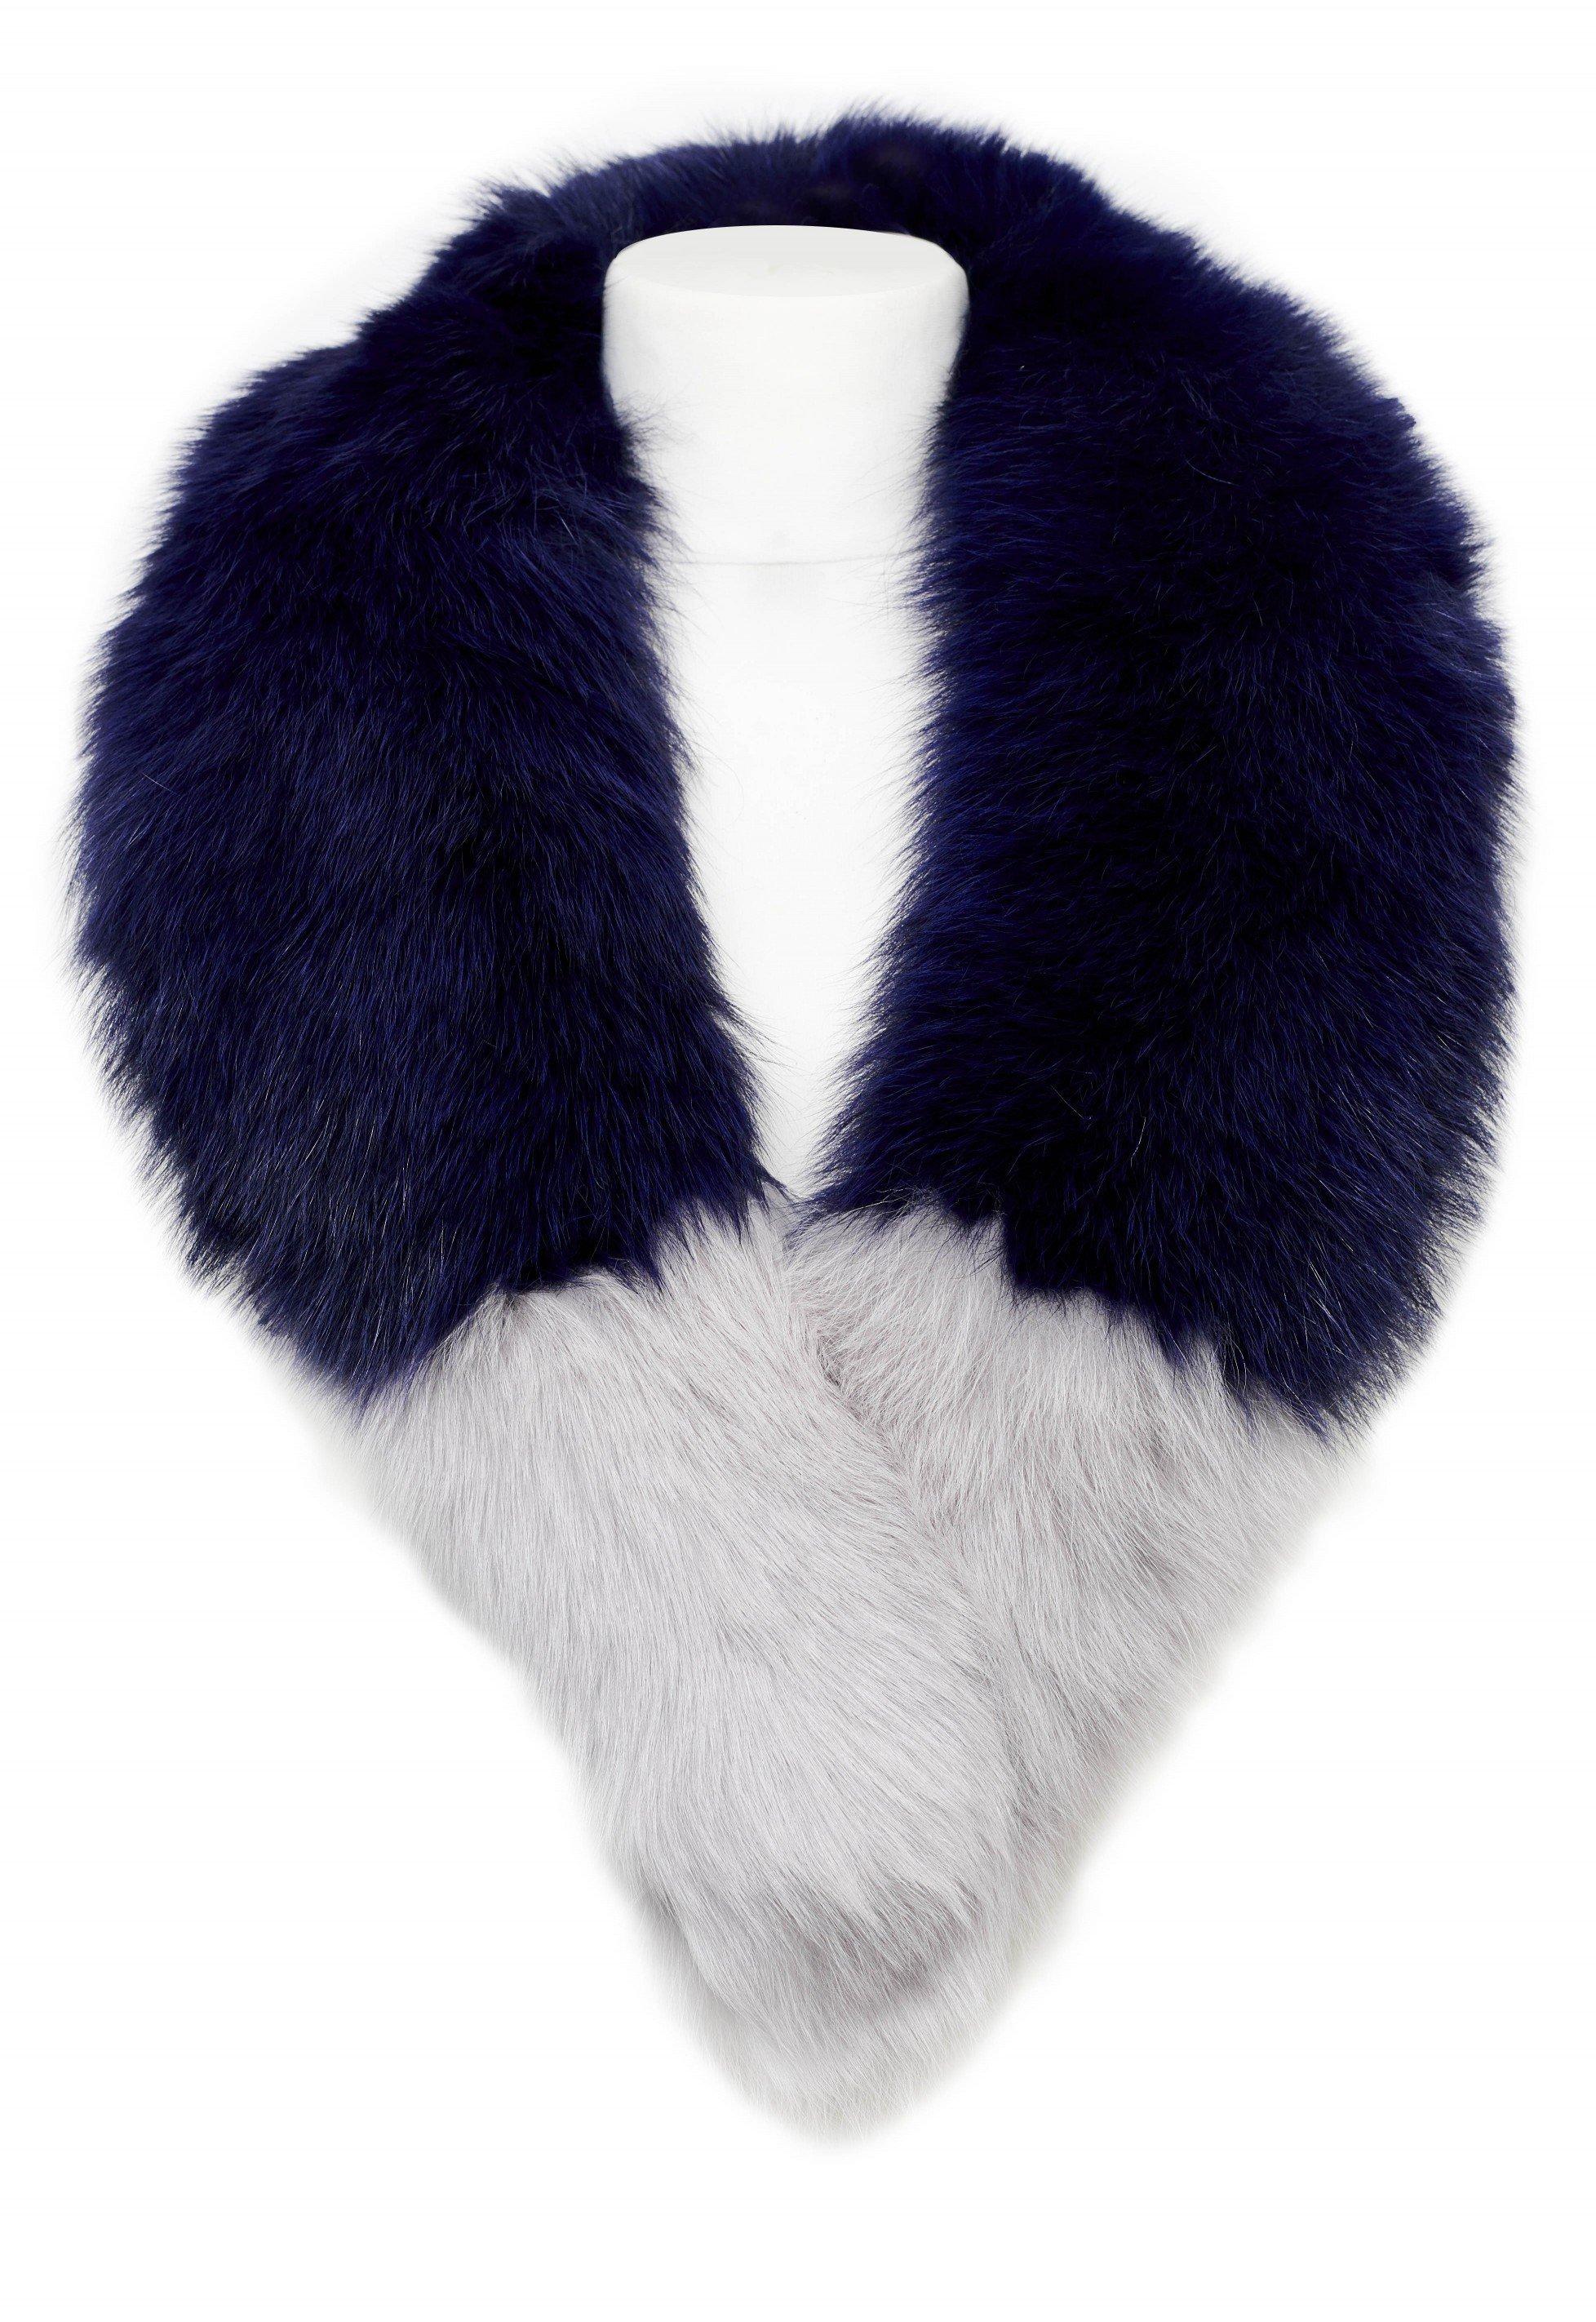 POPSKI LONDON Navy Fox Fur Collar With Light Grey Tips